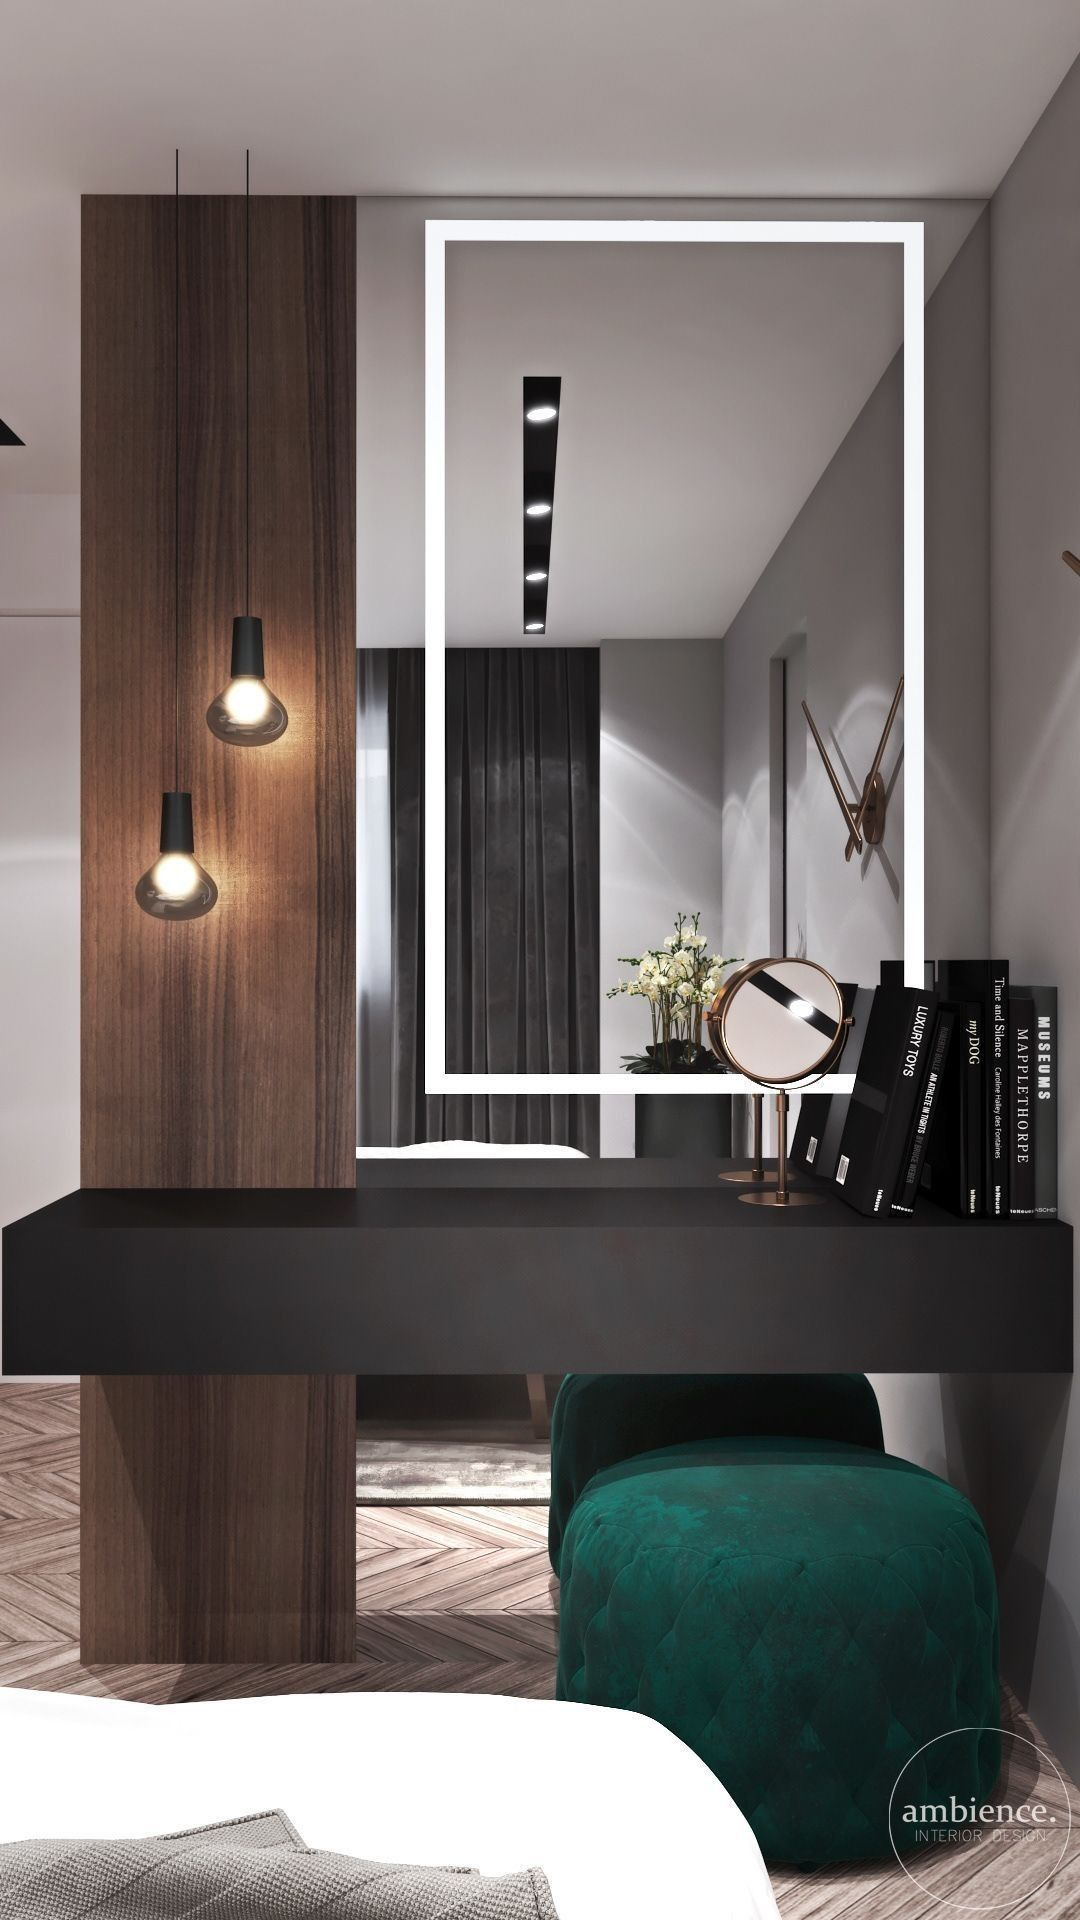 Stylish Homes With Modern Interior Design Arredamento Ingresso